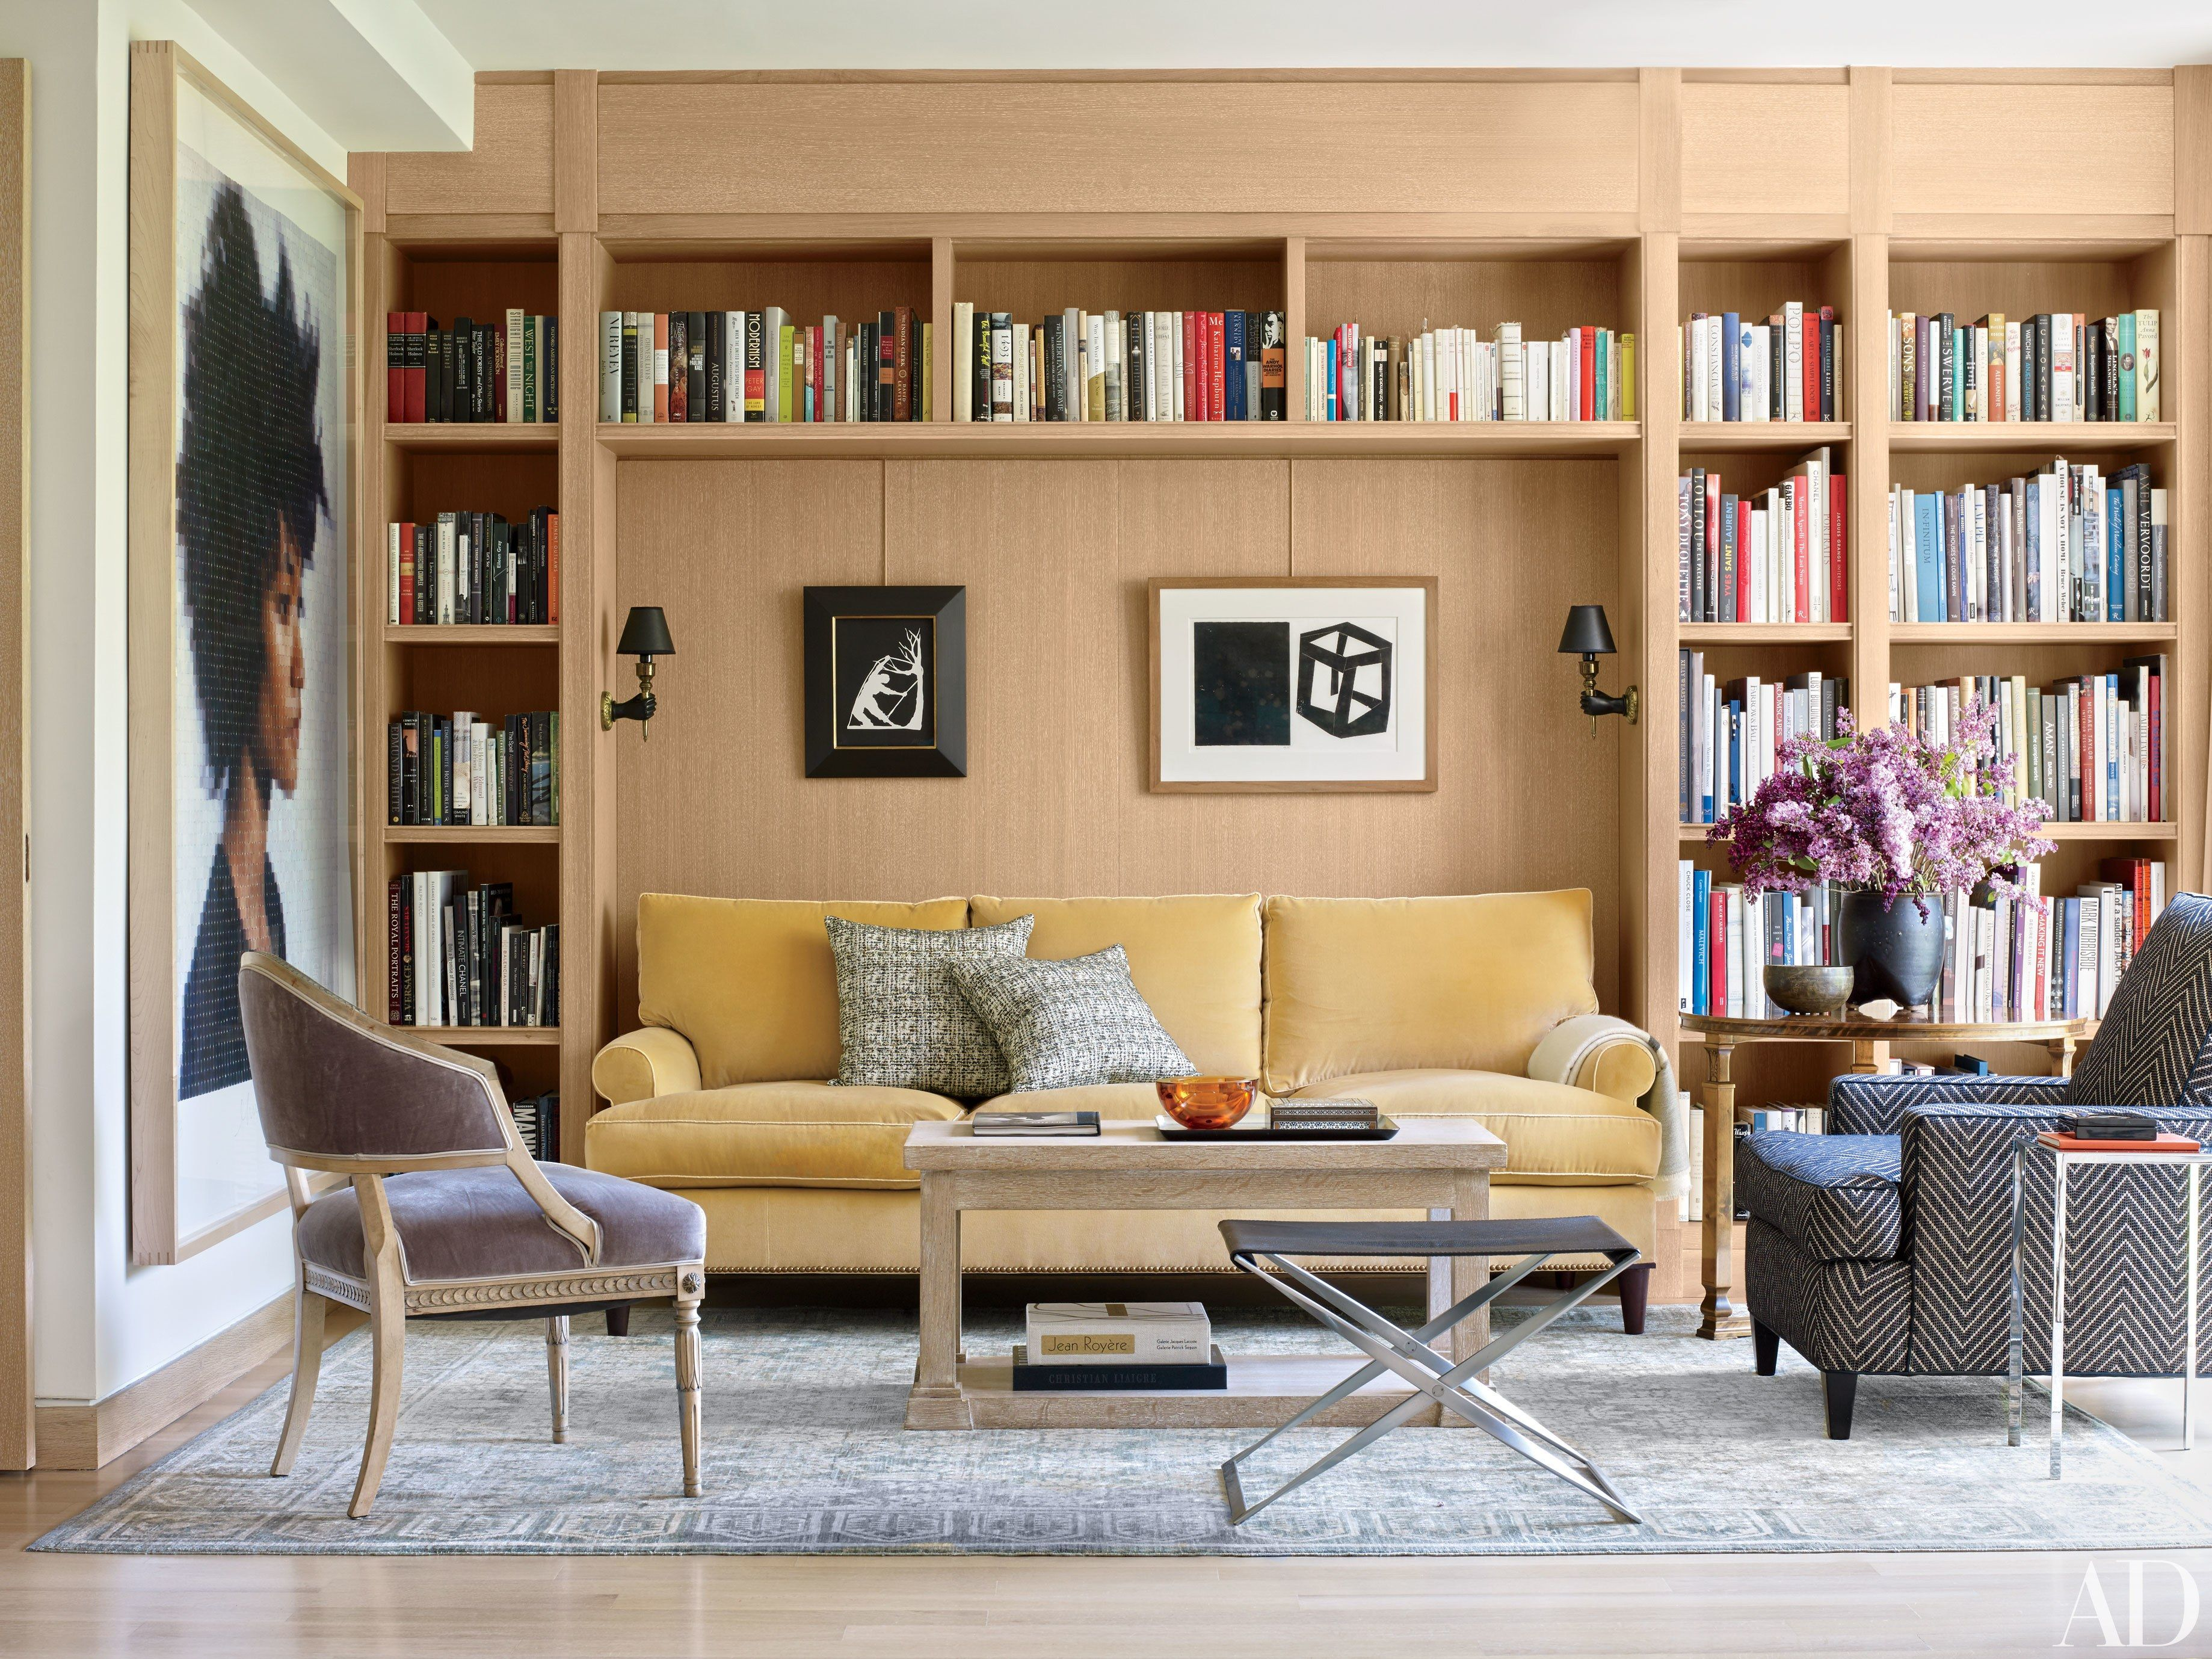 Home interior icon  fashion designers including diane von furstenberg and isaac